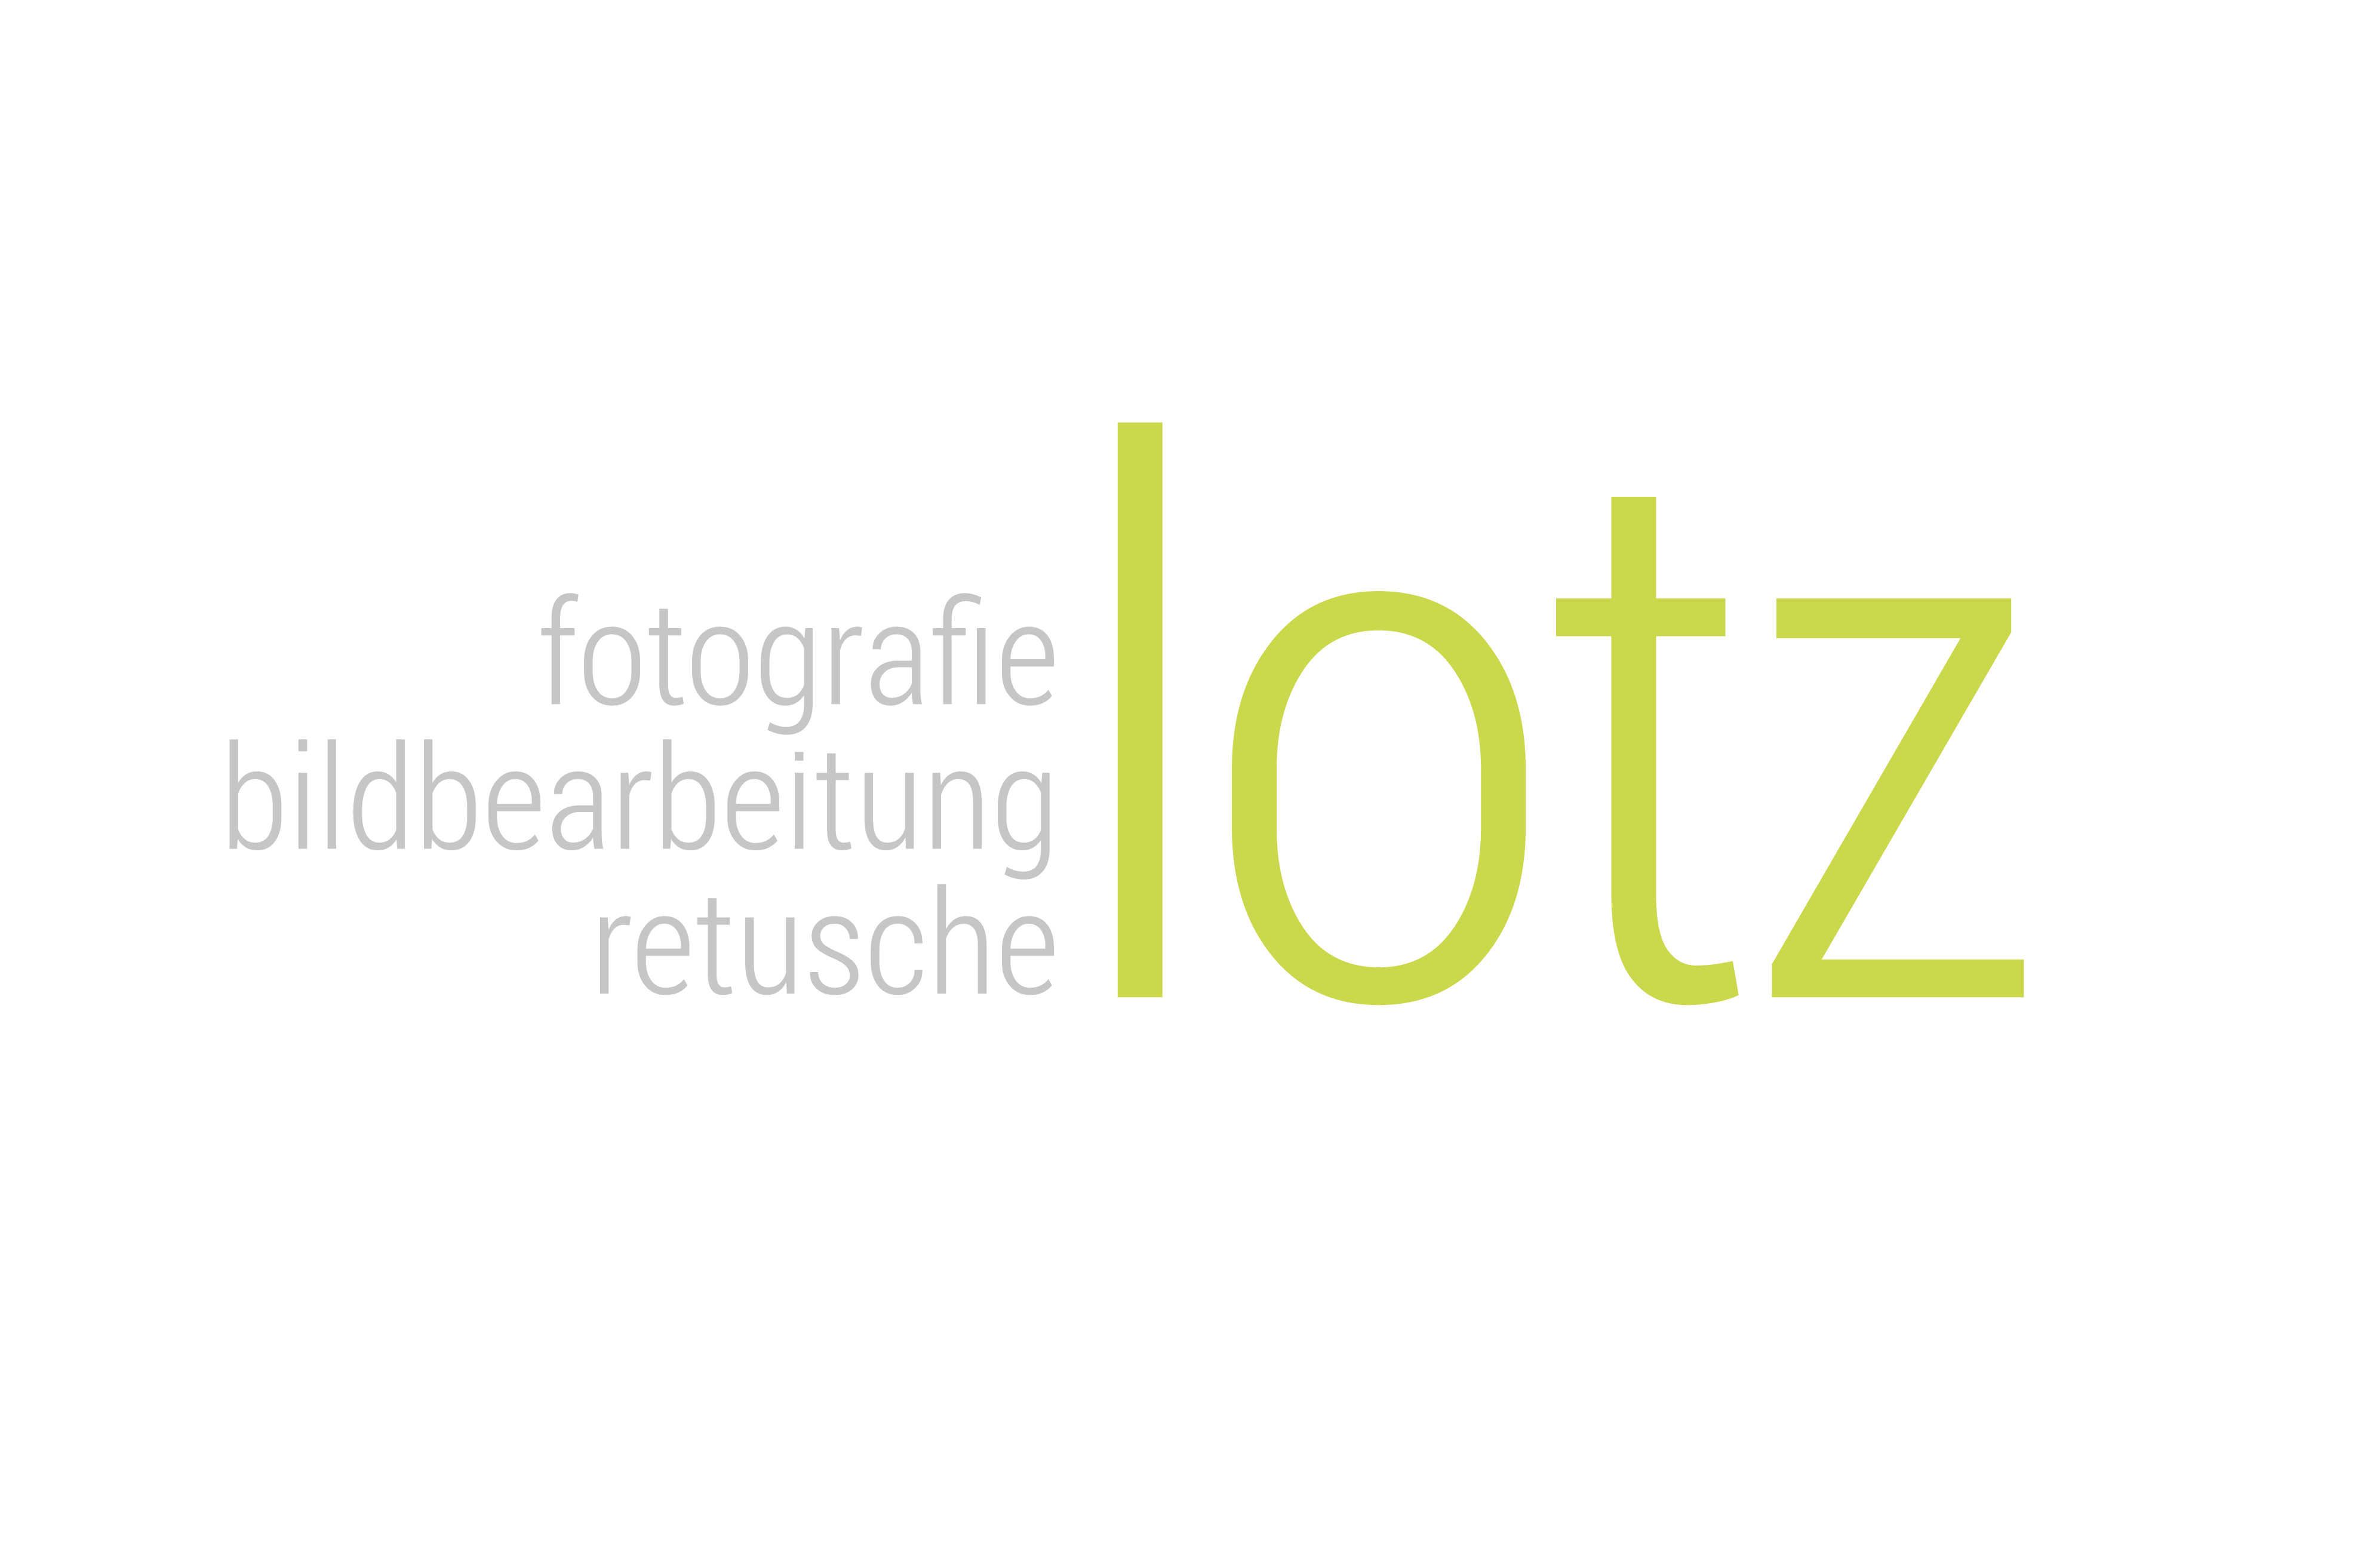 Lotz Fotografie - Kooperationspartner und Netzferk Fotografie